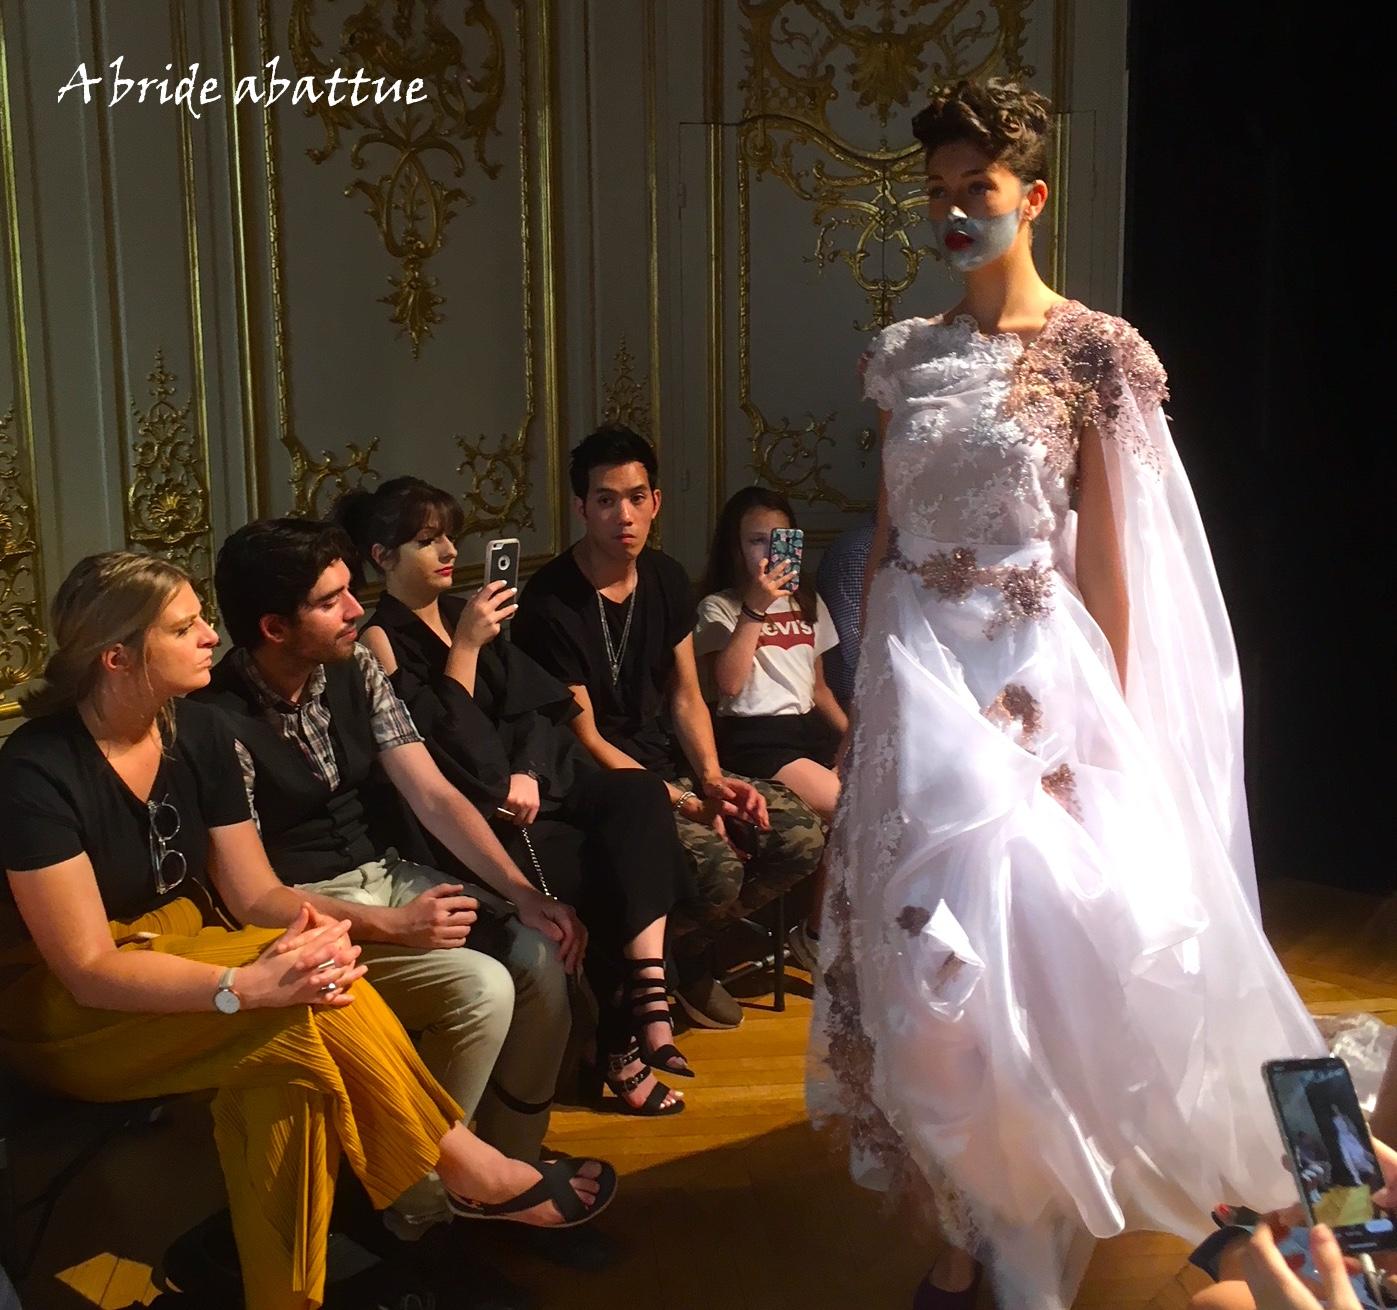 A bride abattue  Défilé haute-couture de Patuna Automne hiver 2018-2019 428bf2f9e23f